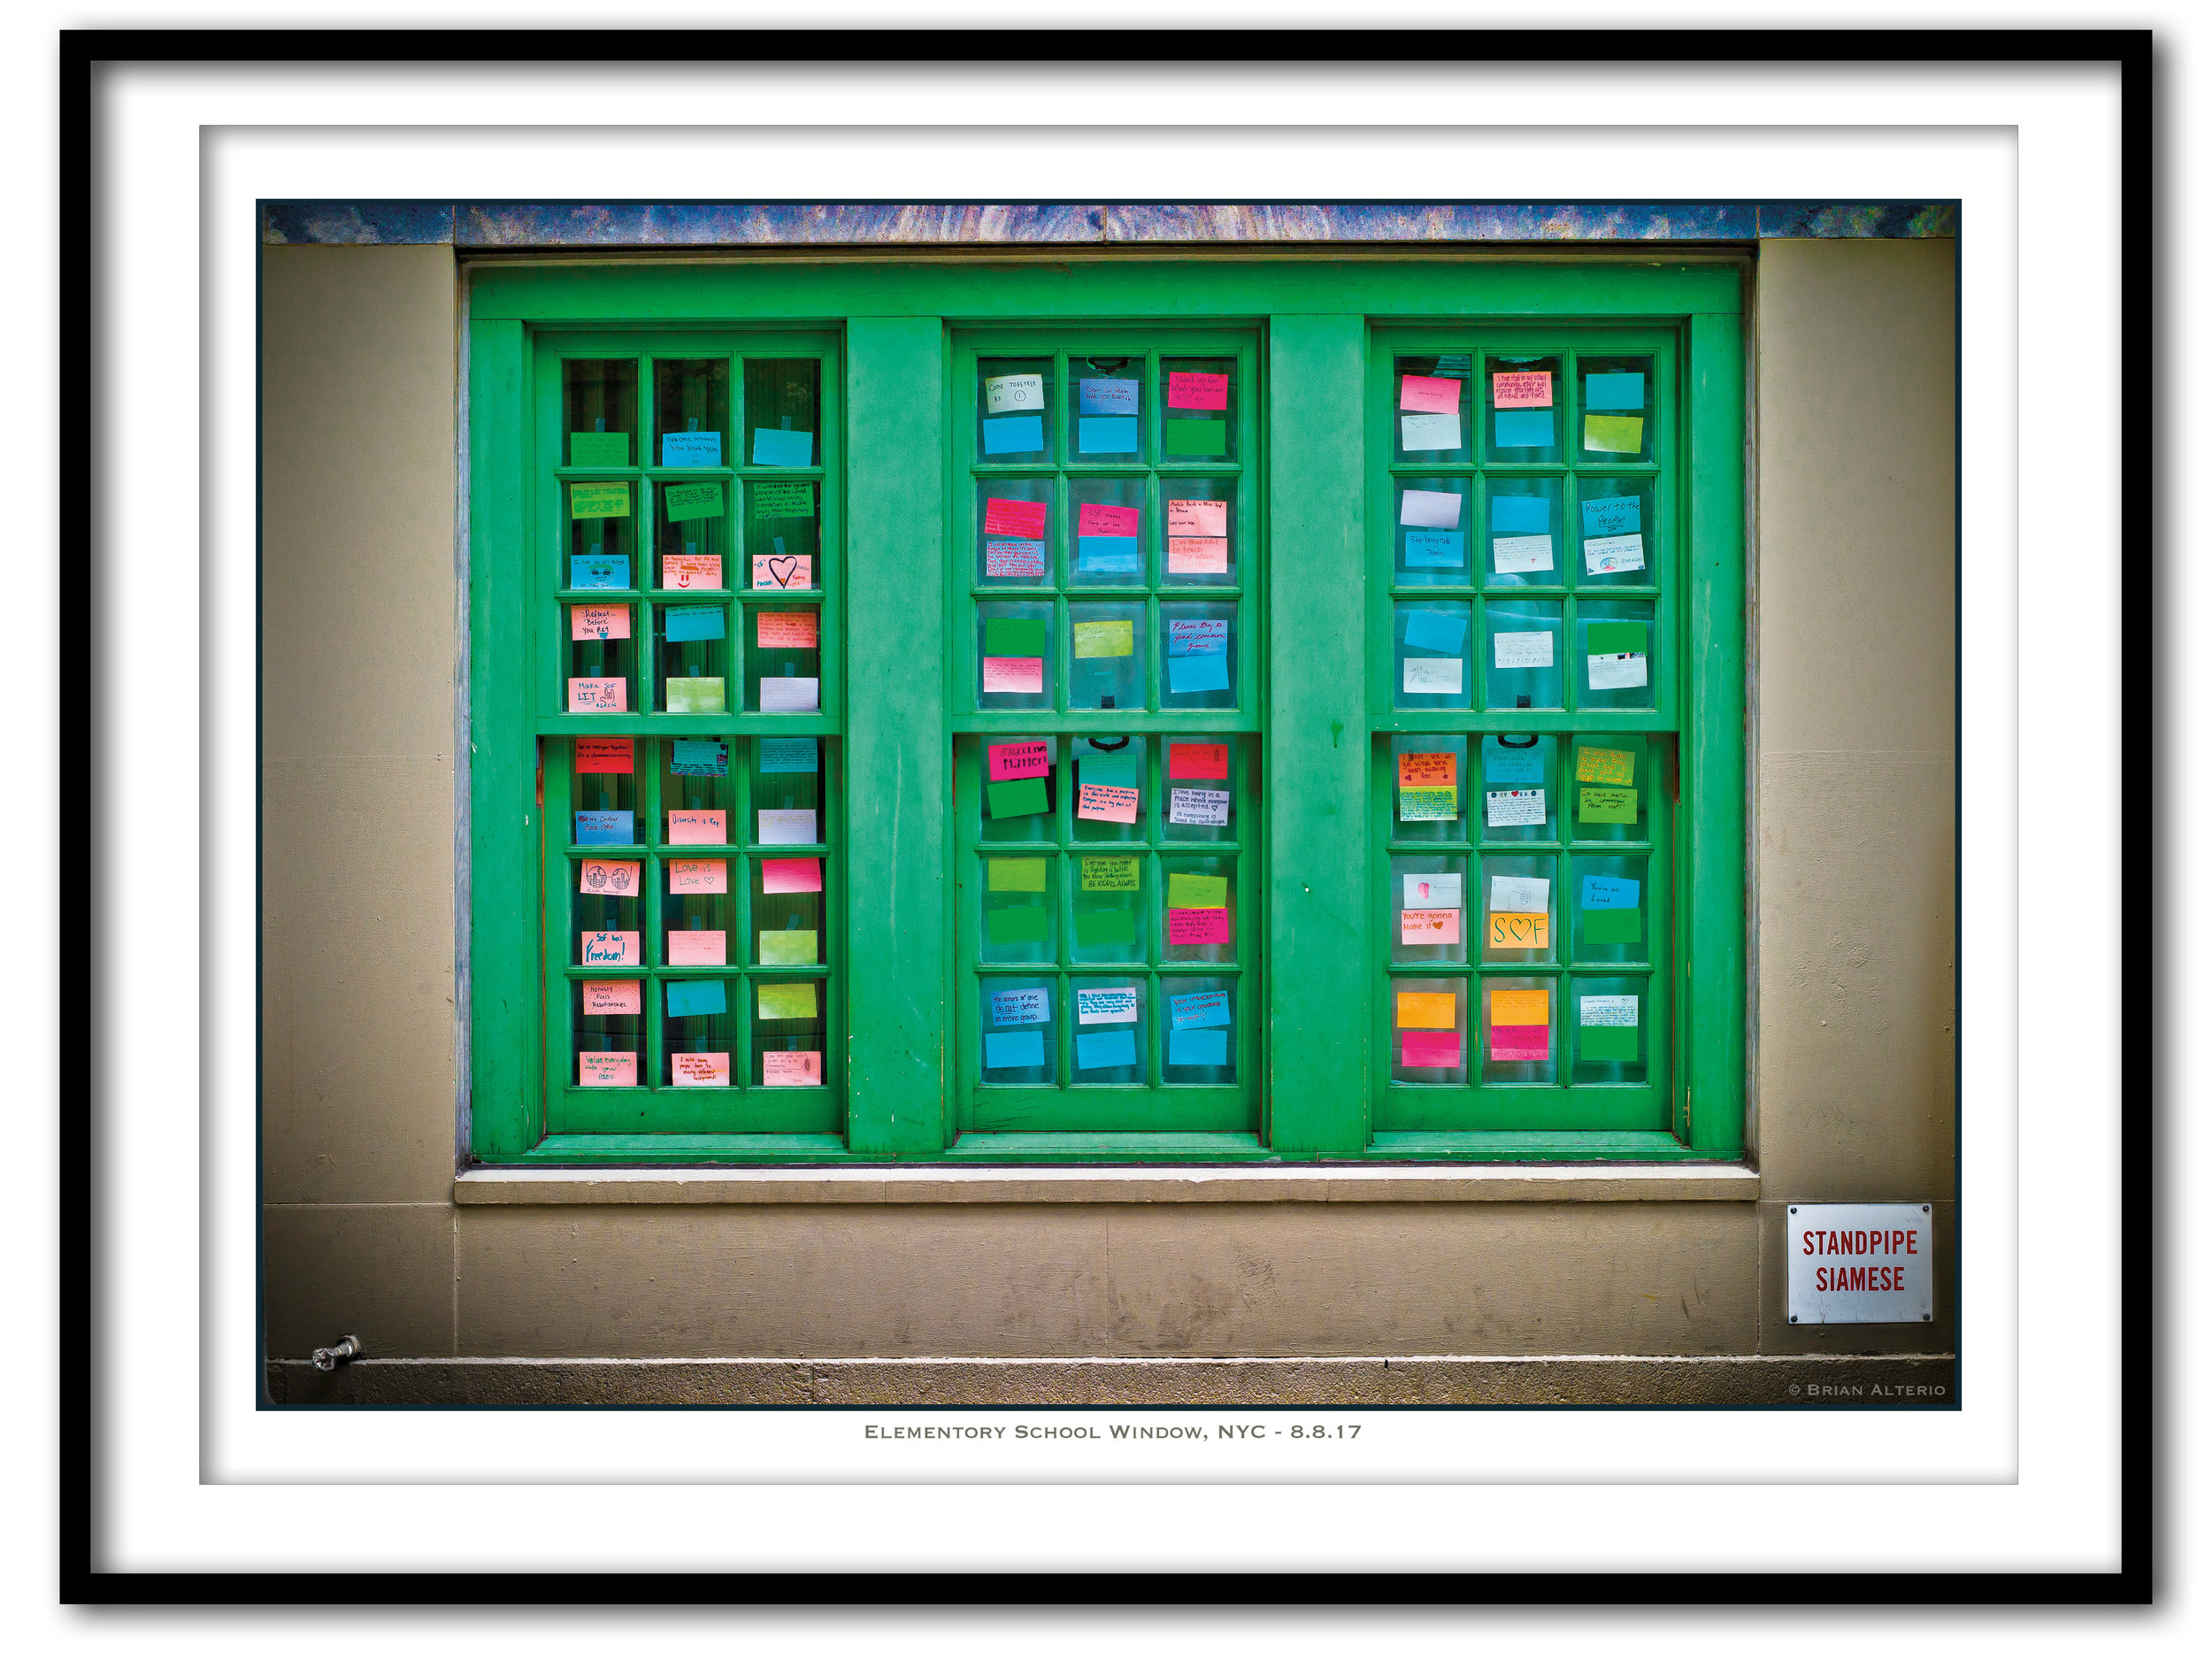 Elementory School Window, NYC - 8.8.17 - Framed.jpg